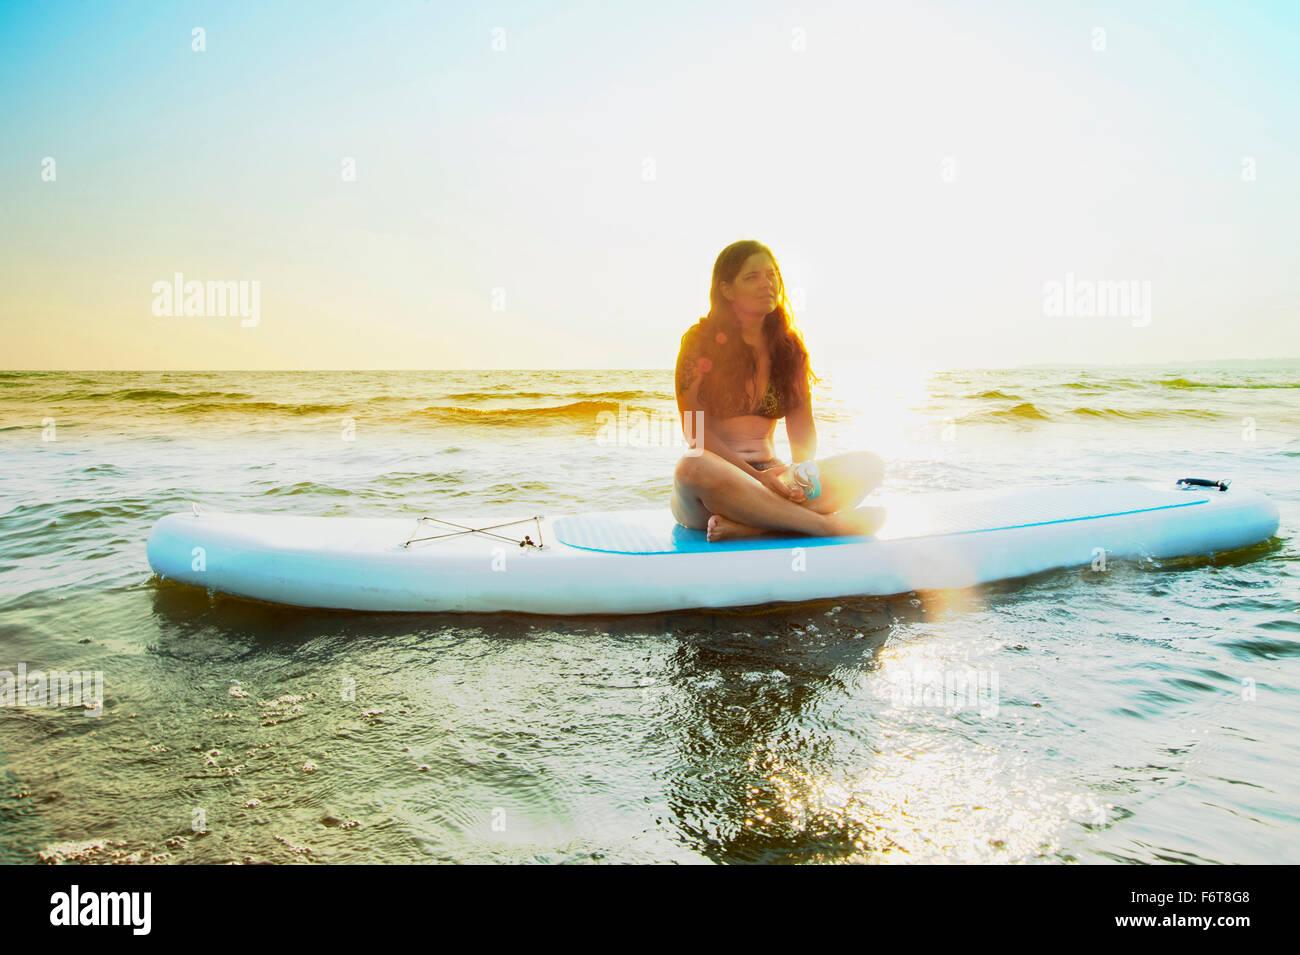 Frau sitzt auf Paddleboard in See Stockbild